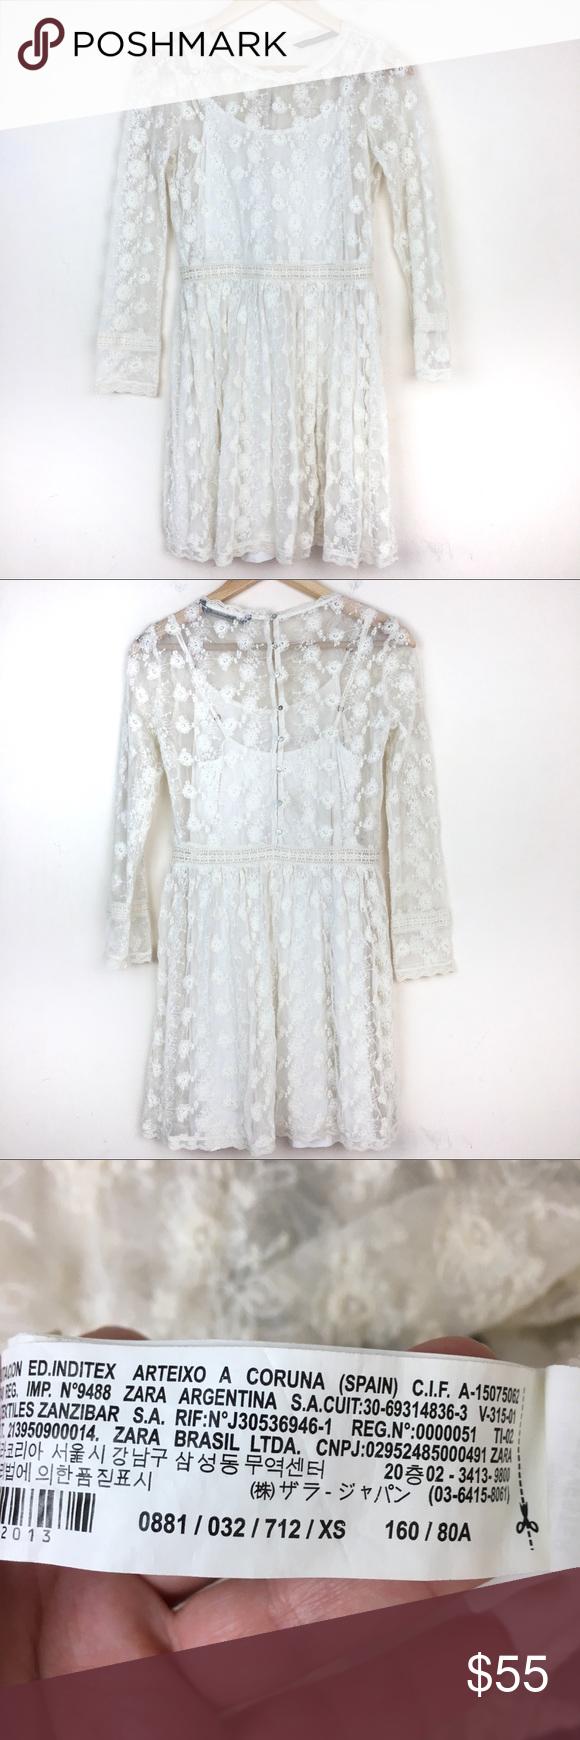 White lace dress zara  Zara Off White Lace Long Sleeve Mini Dress  My Posh Picks  Pinterest